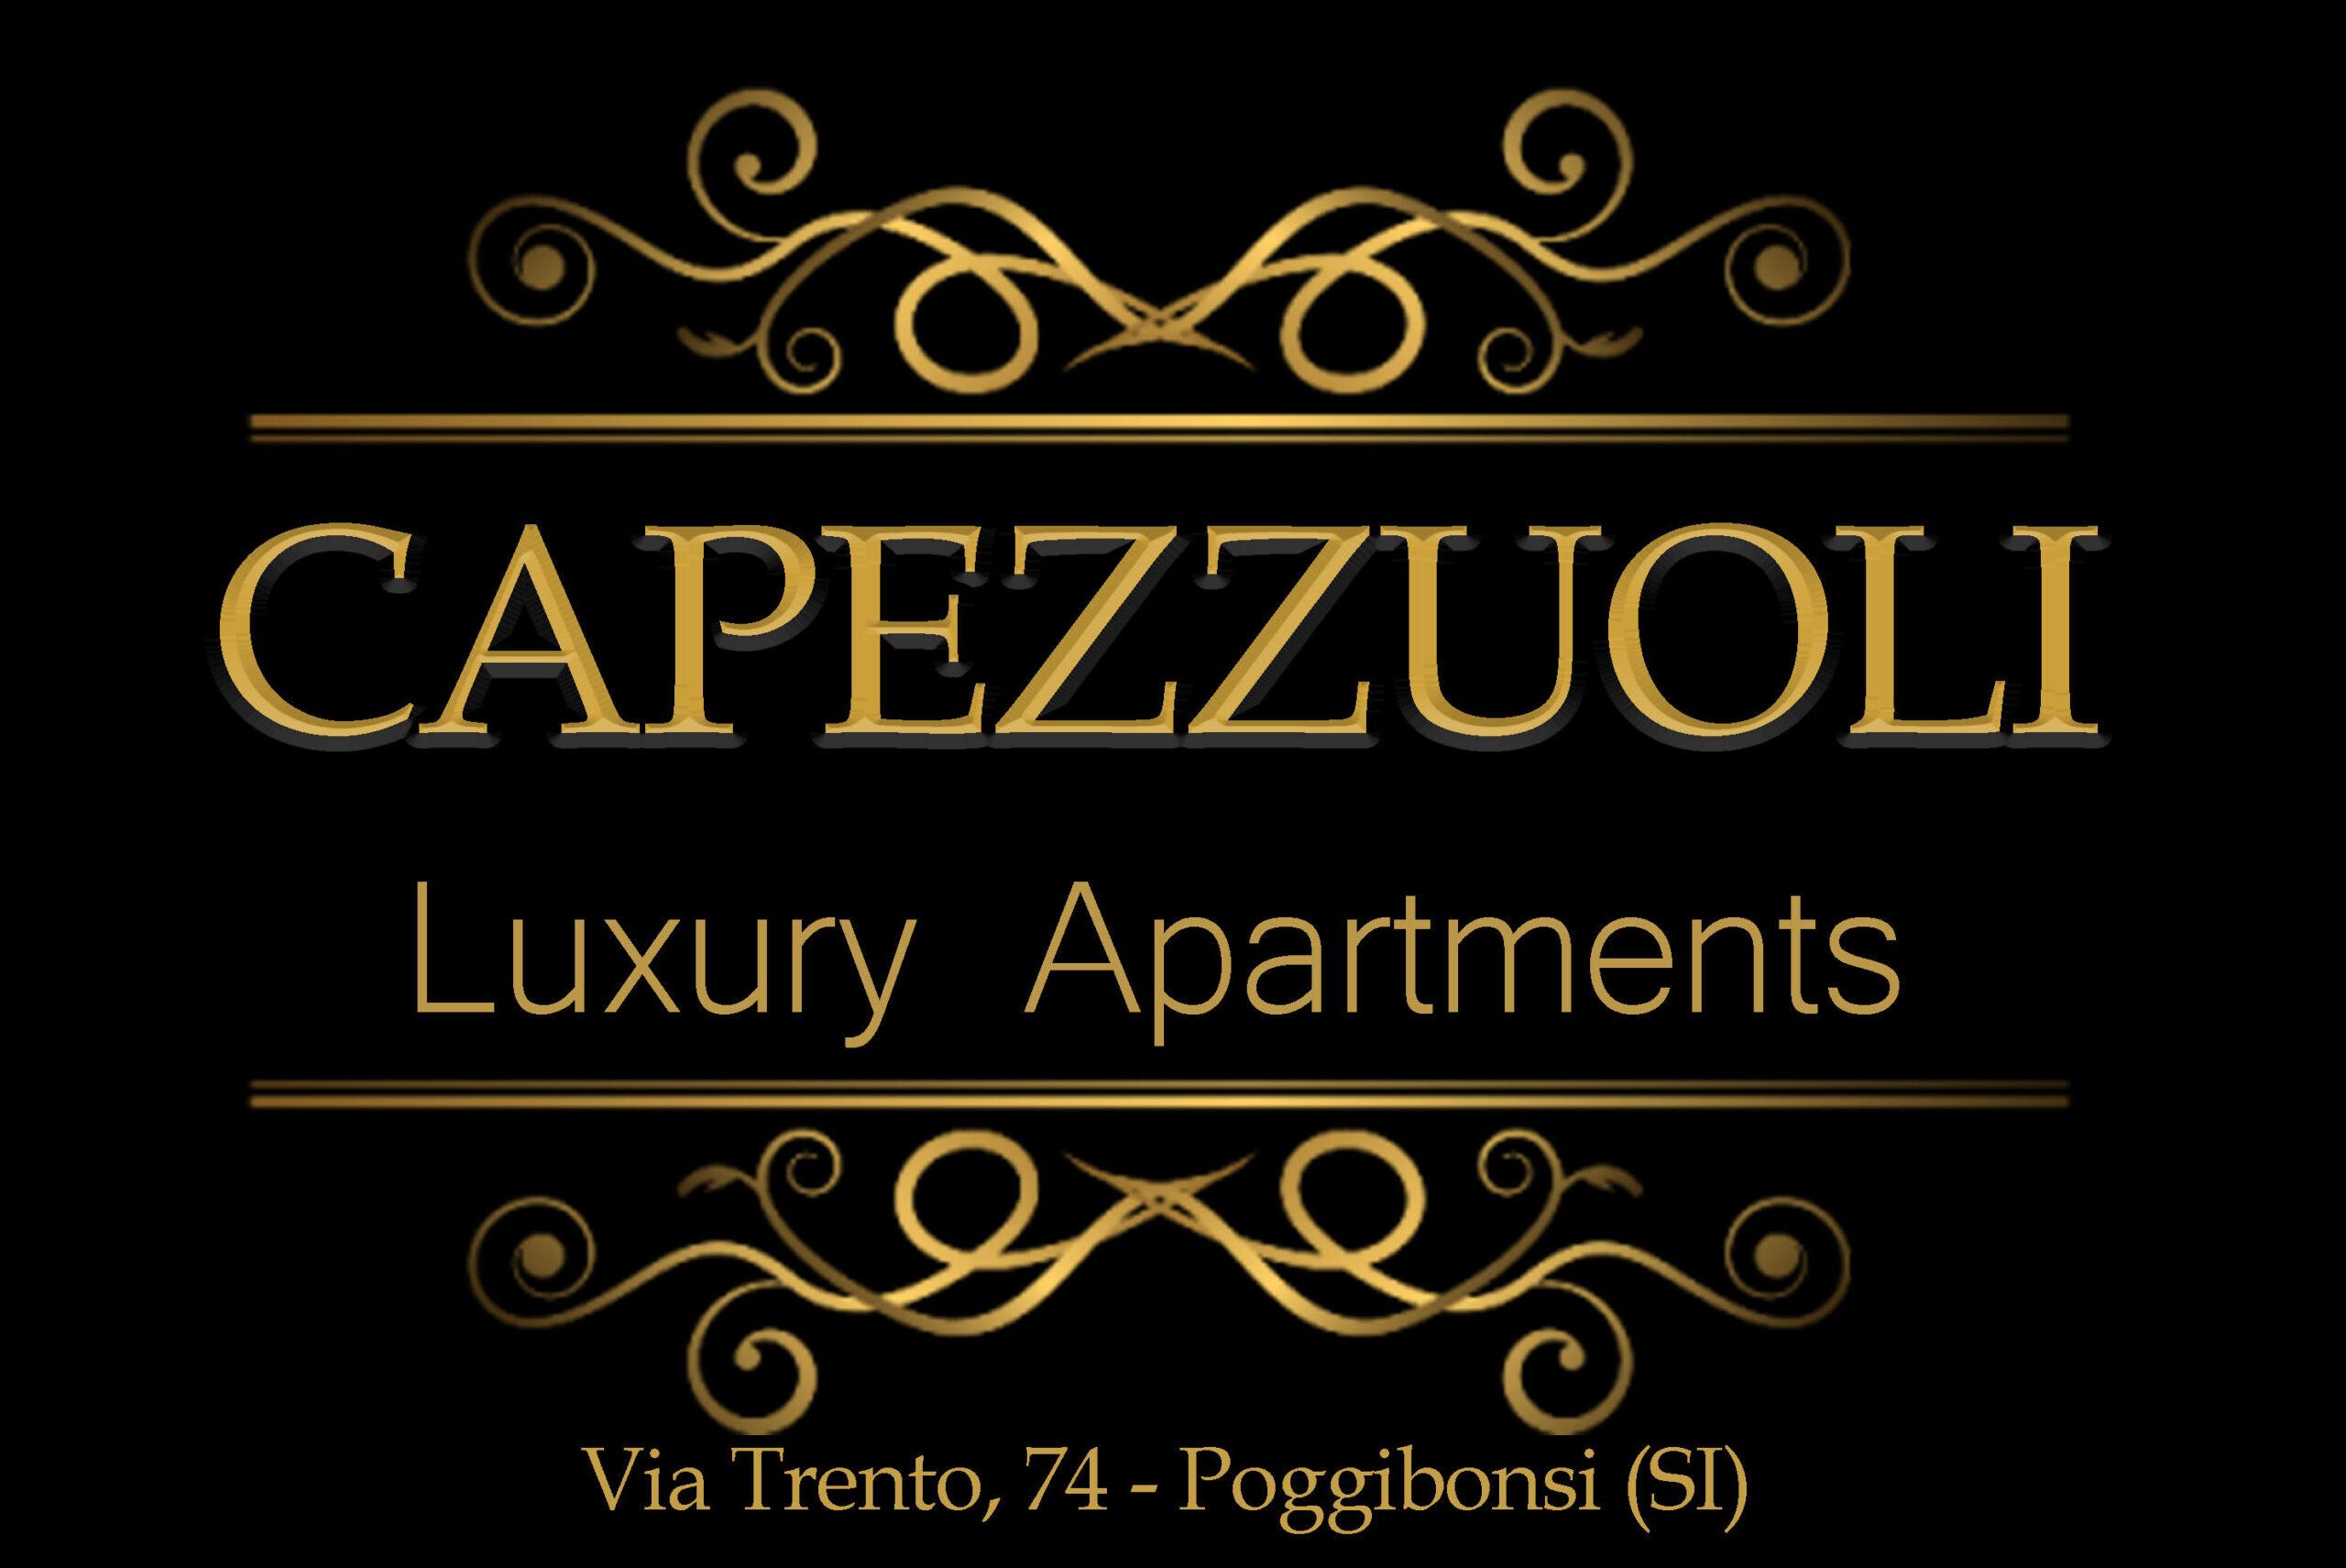 Capezzuoli Luxury Apartments